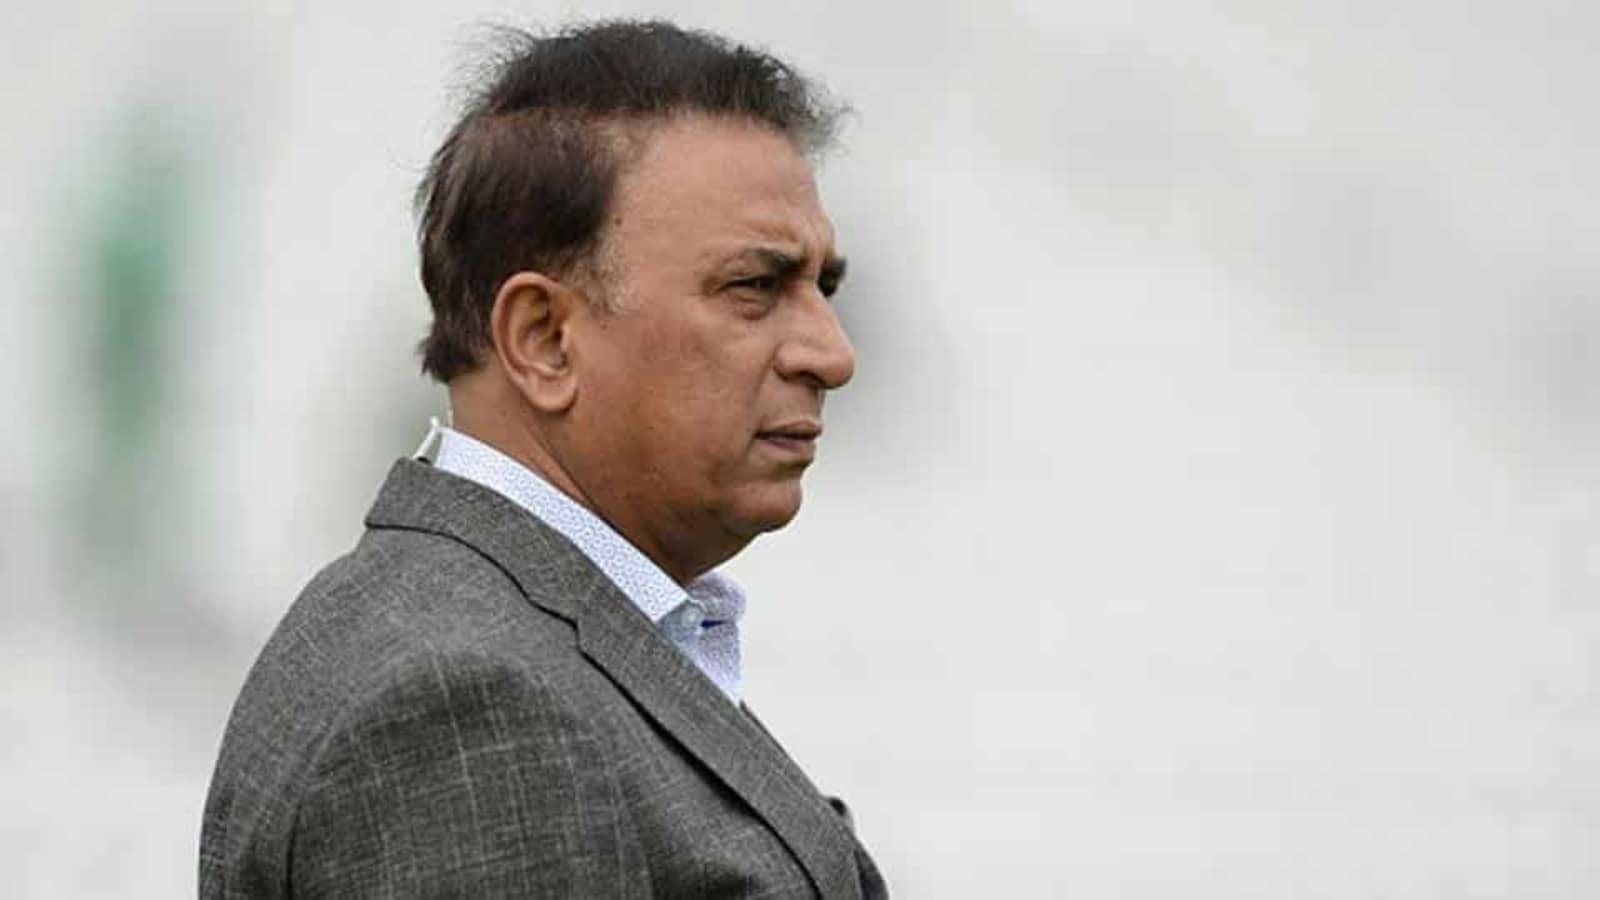 'Axar Patel grabbed his opportunities': Sunil Gavaskar says it will 'not be easy for Ravindra Jadeja to break into team' - Hindustan Times